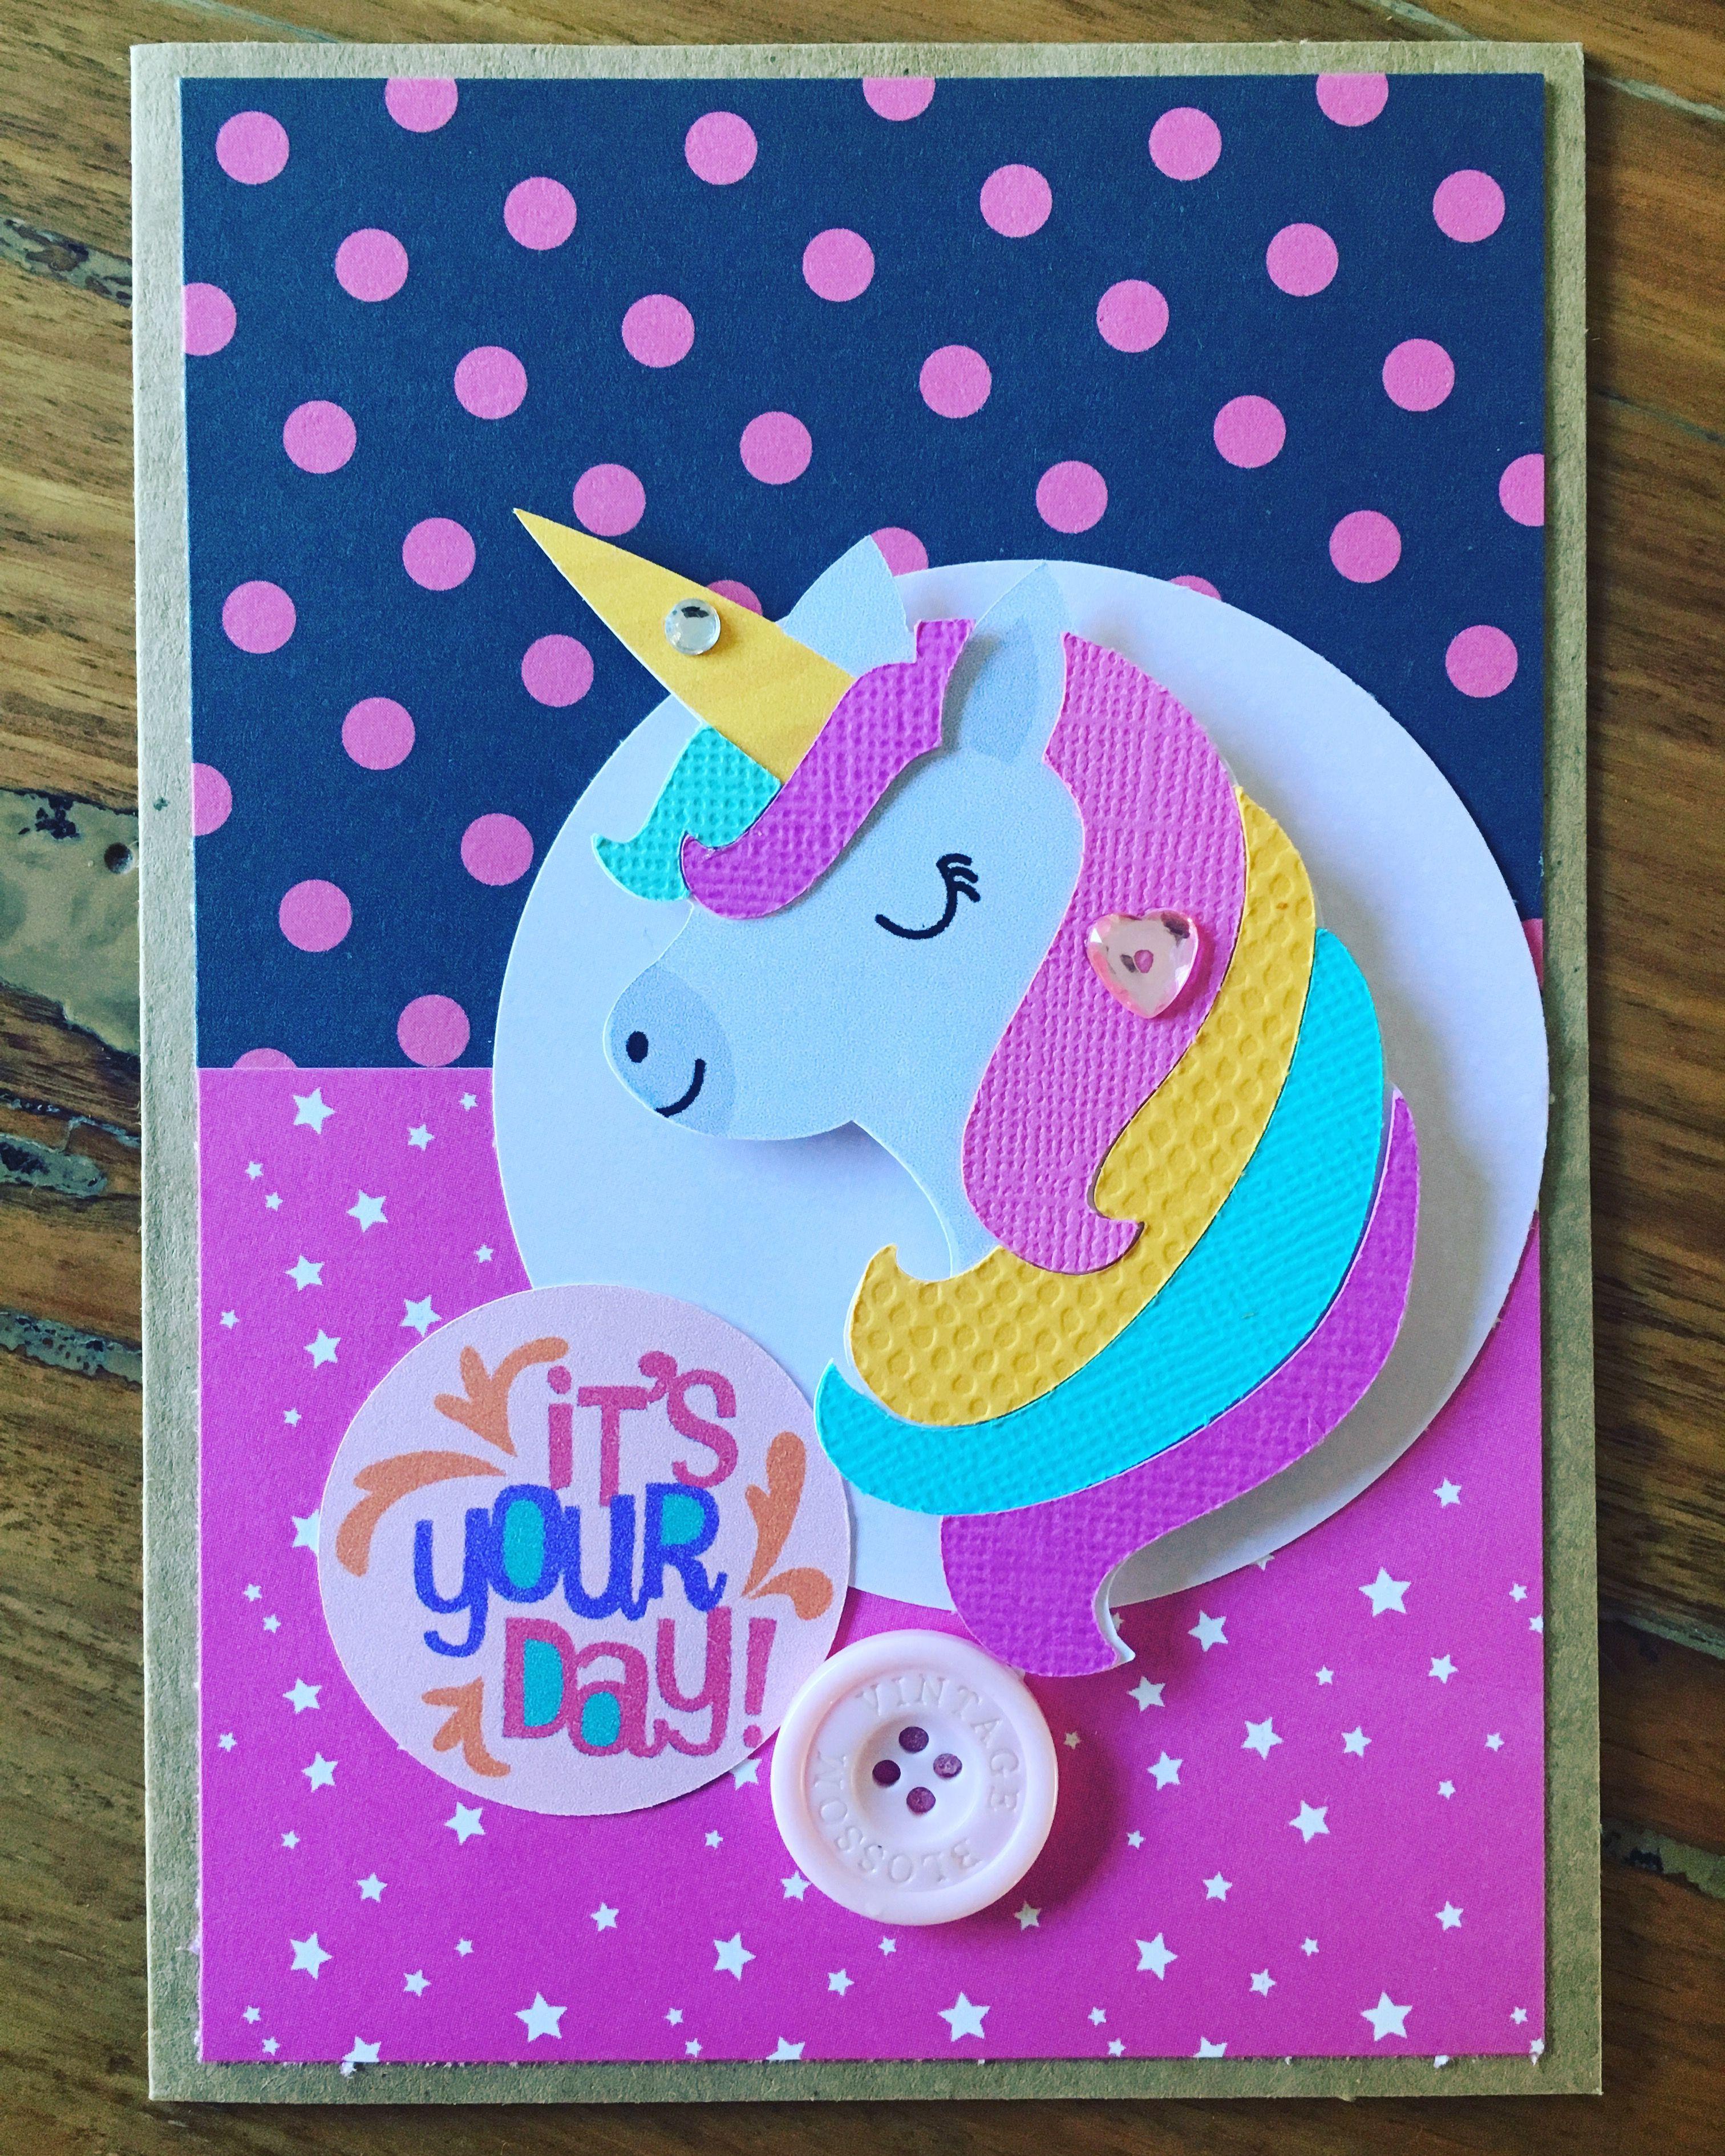 File Cards 10 Heart Svg: Unicorn Svg Diecut Cut File Cricut Card Tag Party